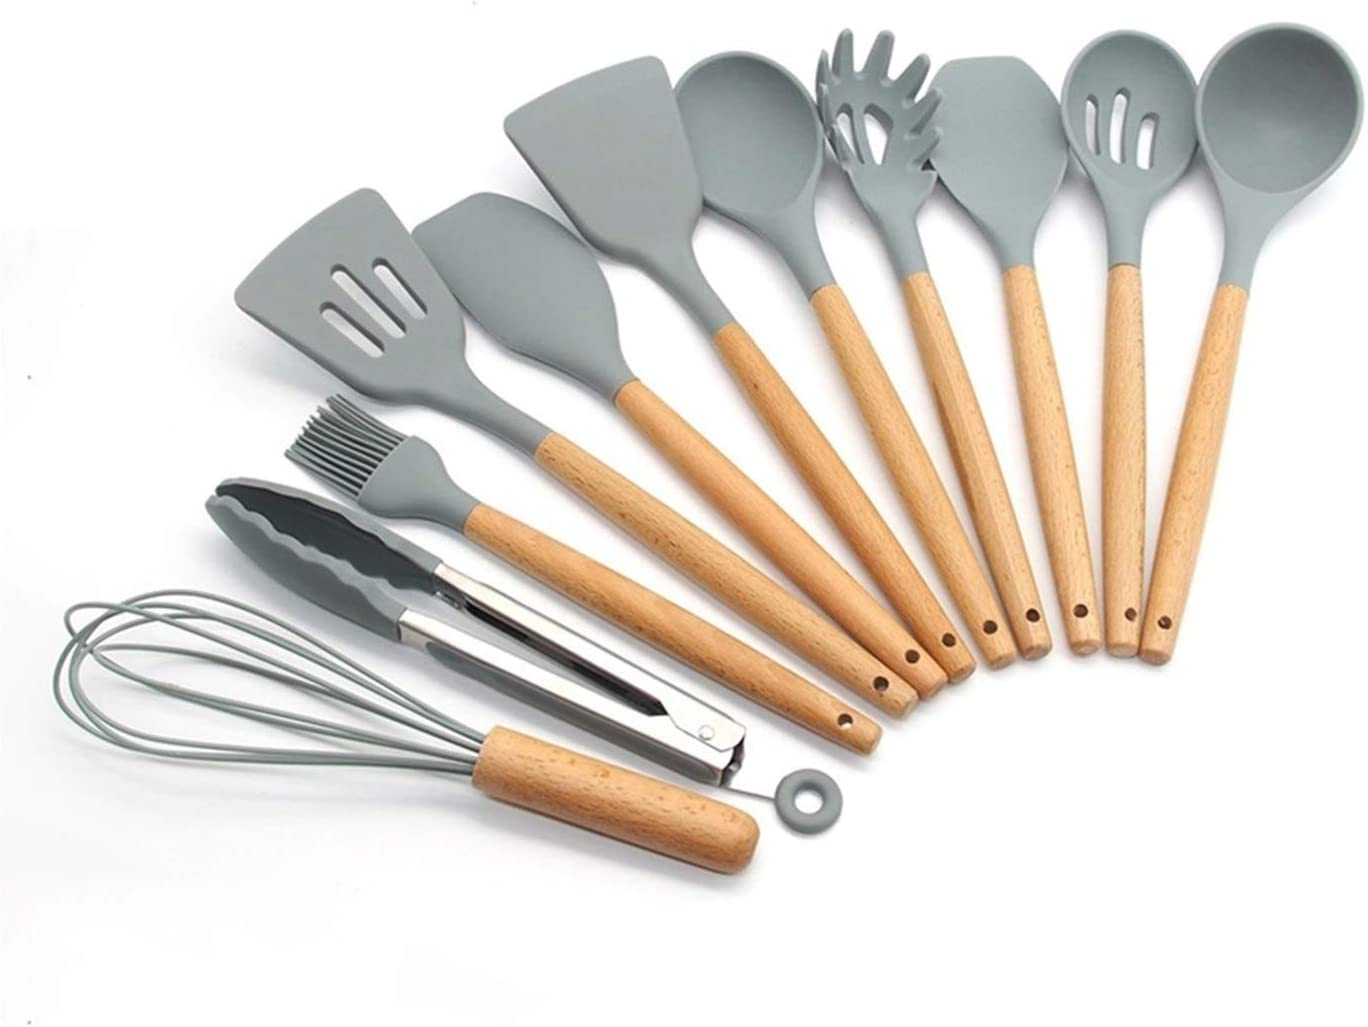 Louisville-Jefferson County Mall NDJPN Silicone Cooking Utensils 11 13Pcs Utensil 12 Set Free shipping on posting reviews Kitchen